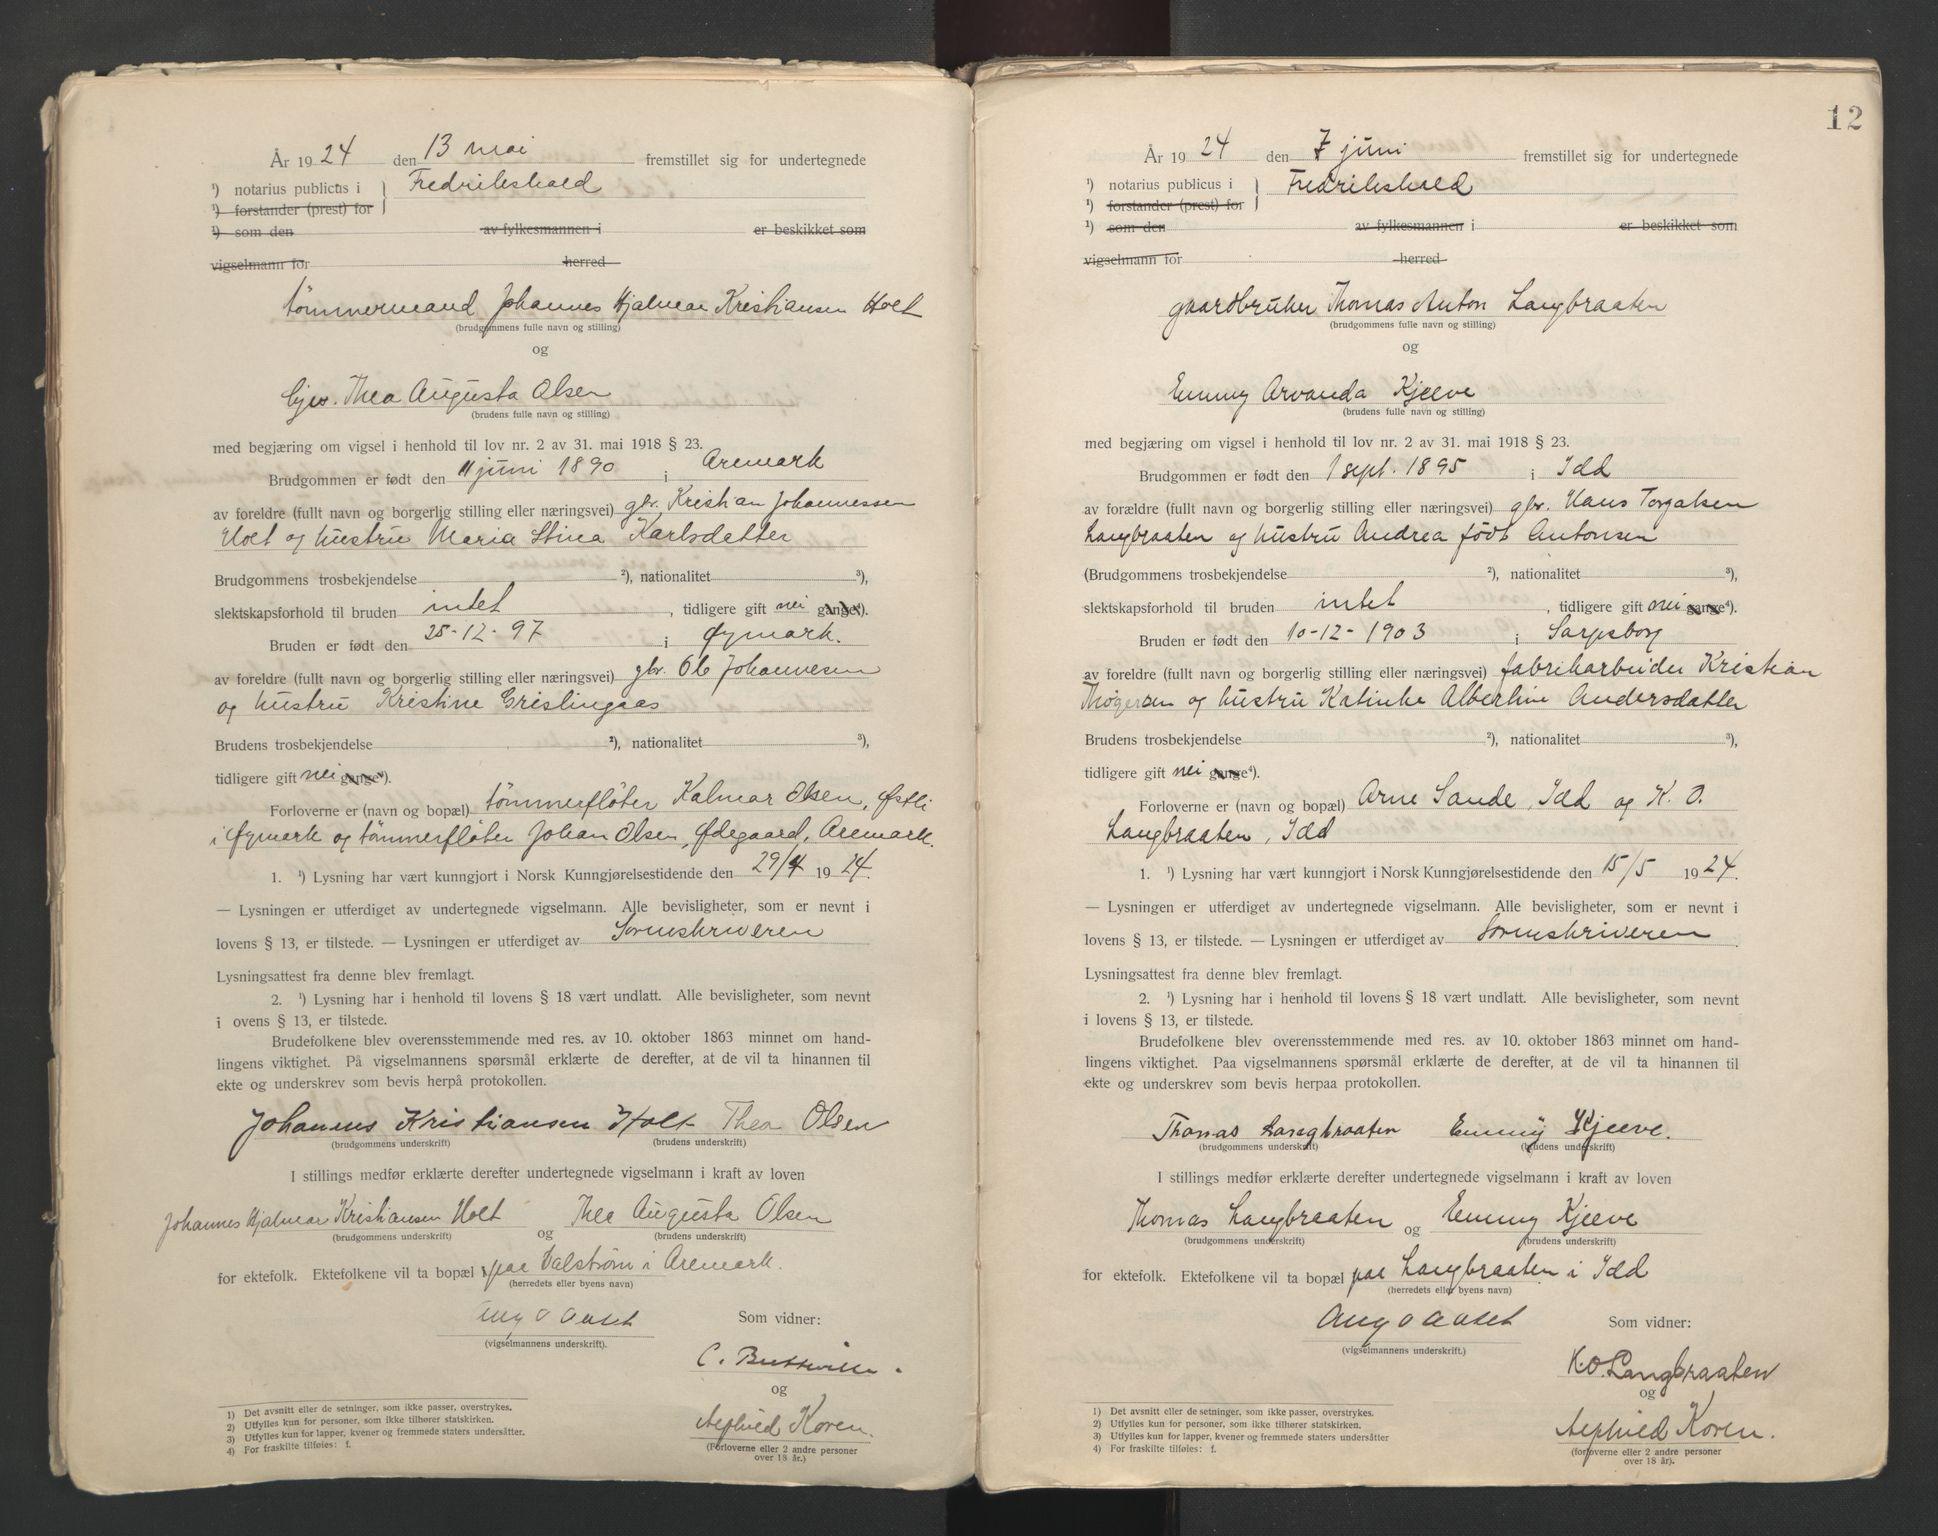 SAO, Idd og Marker sorenskriveri, L/Lc/L0001: Vigselsbøker, 1920-1942, s. 12